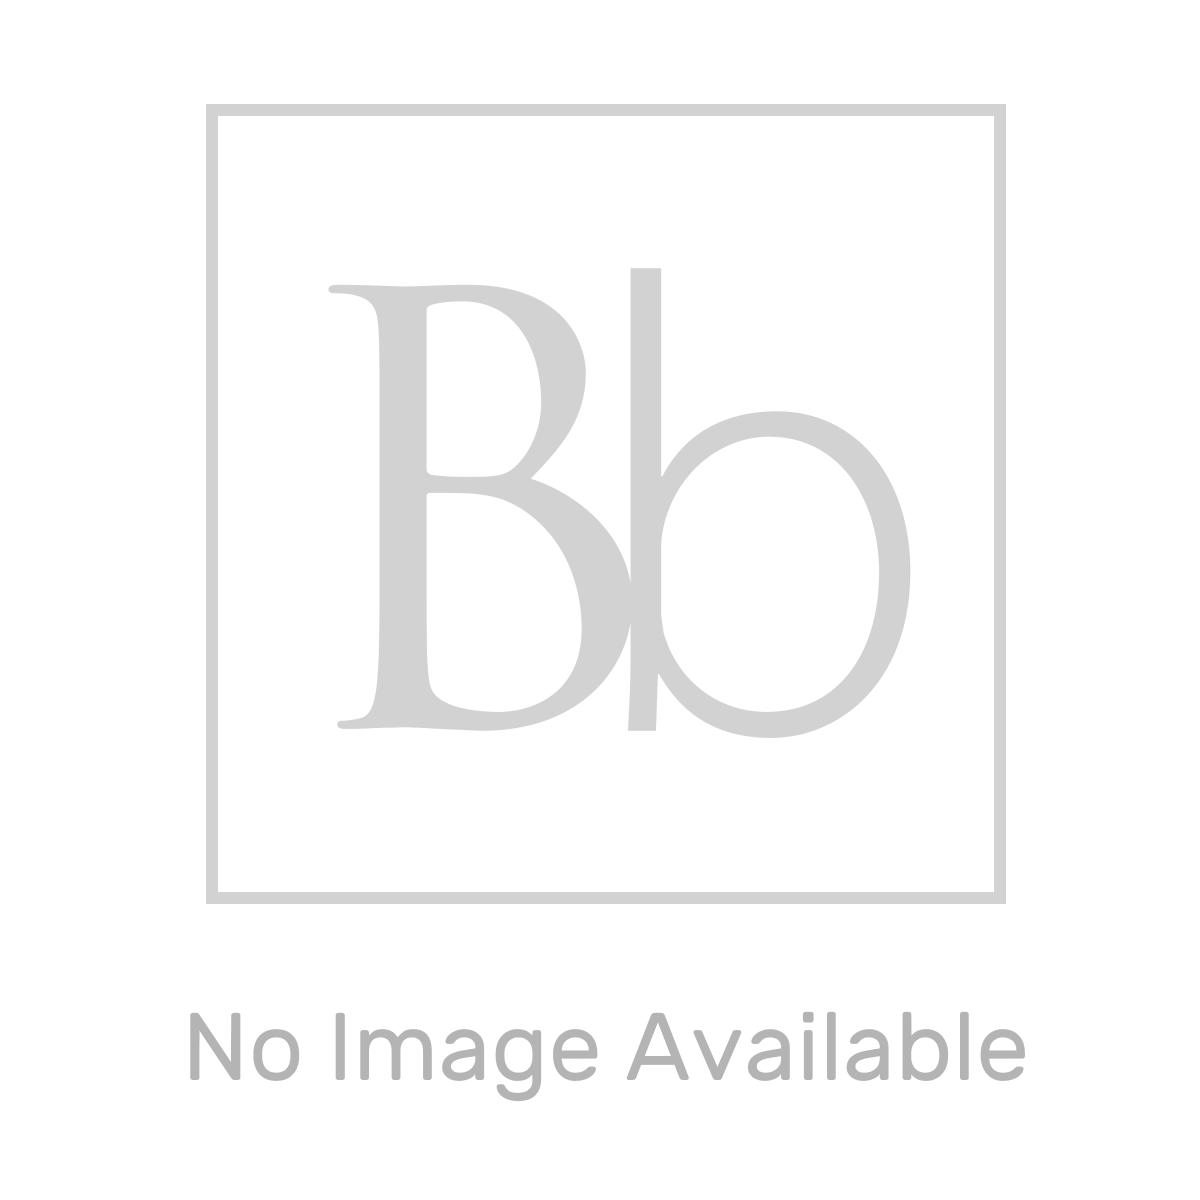 RAK Precious Uni Dark Black Wall Hung Counter Basin 1000mm with Brackets Measurements